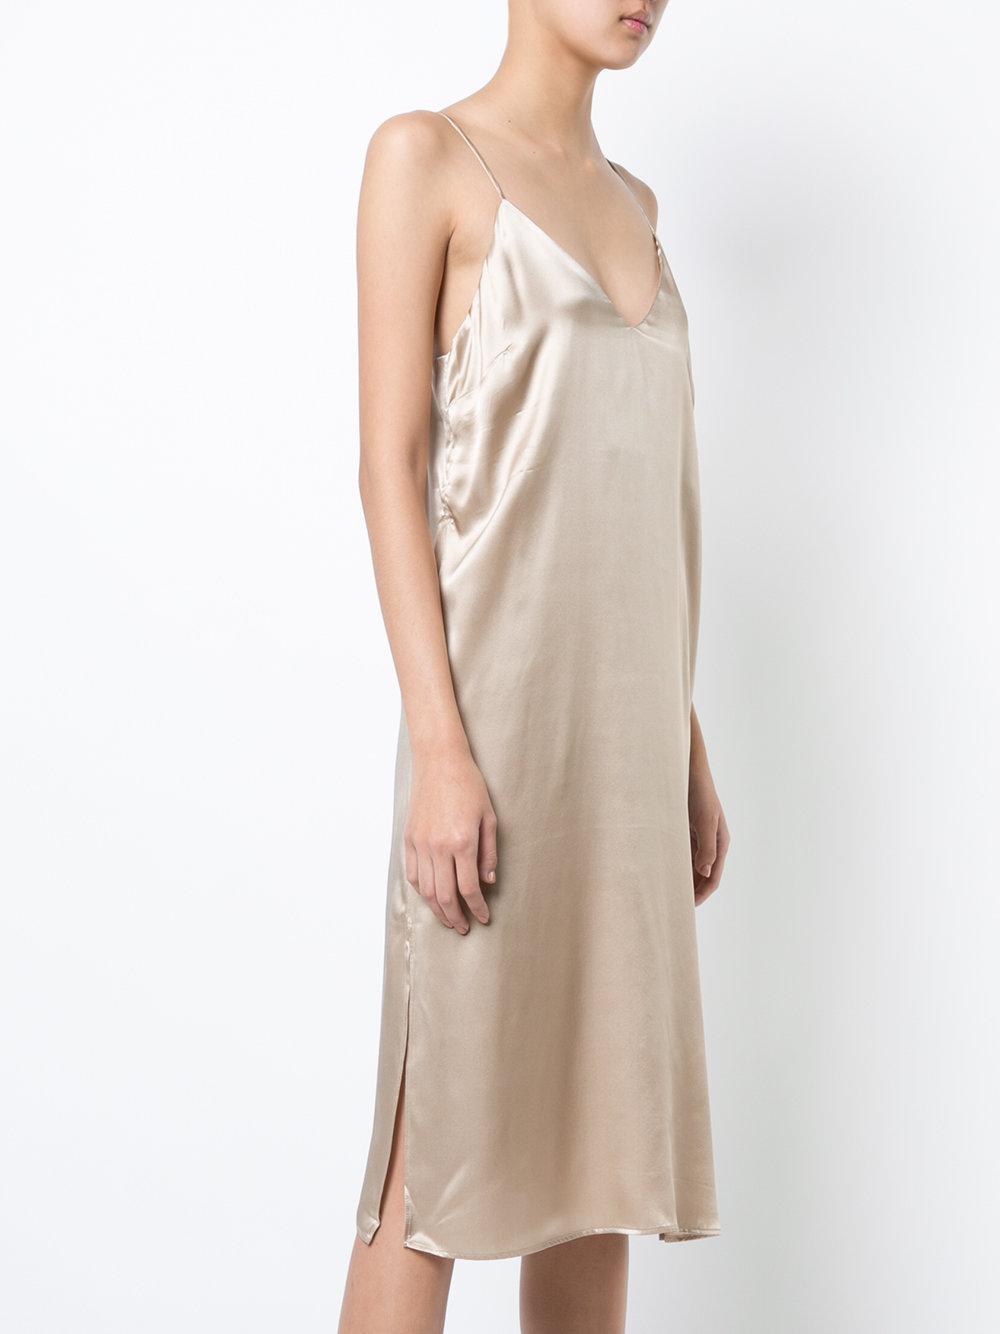 59d24766d6ae Anine Bing Gemma Dress in Natural - Lyst